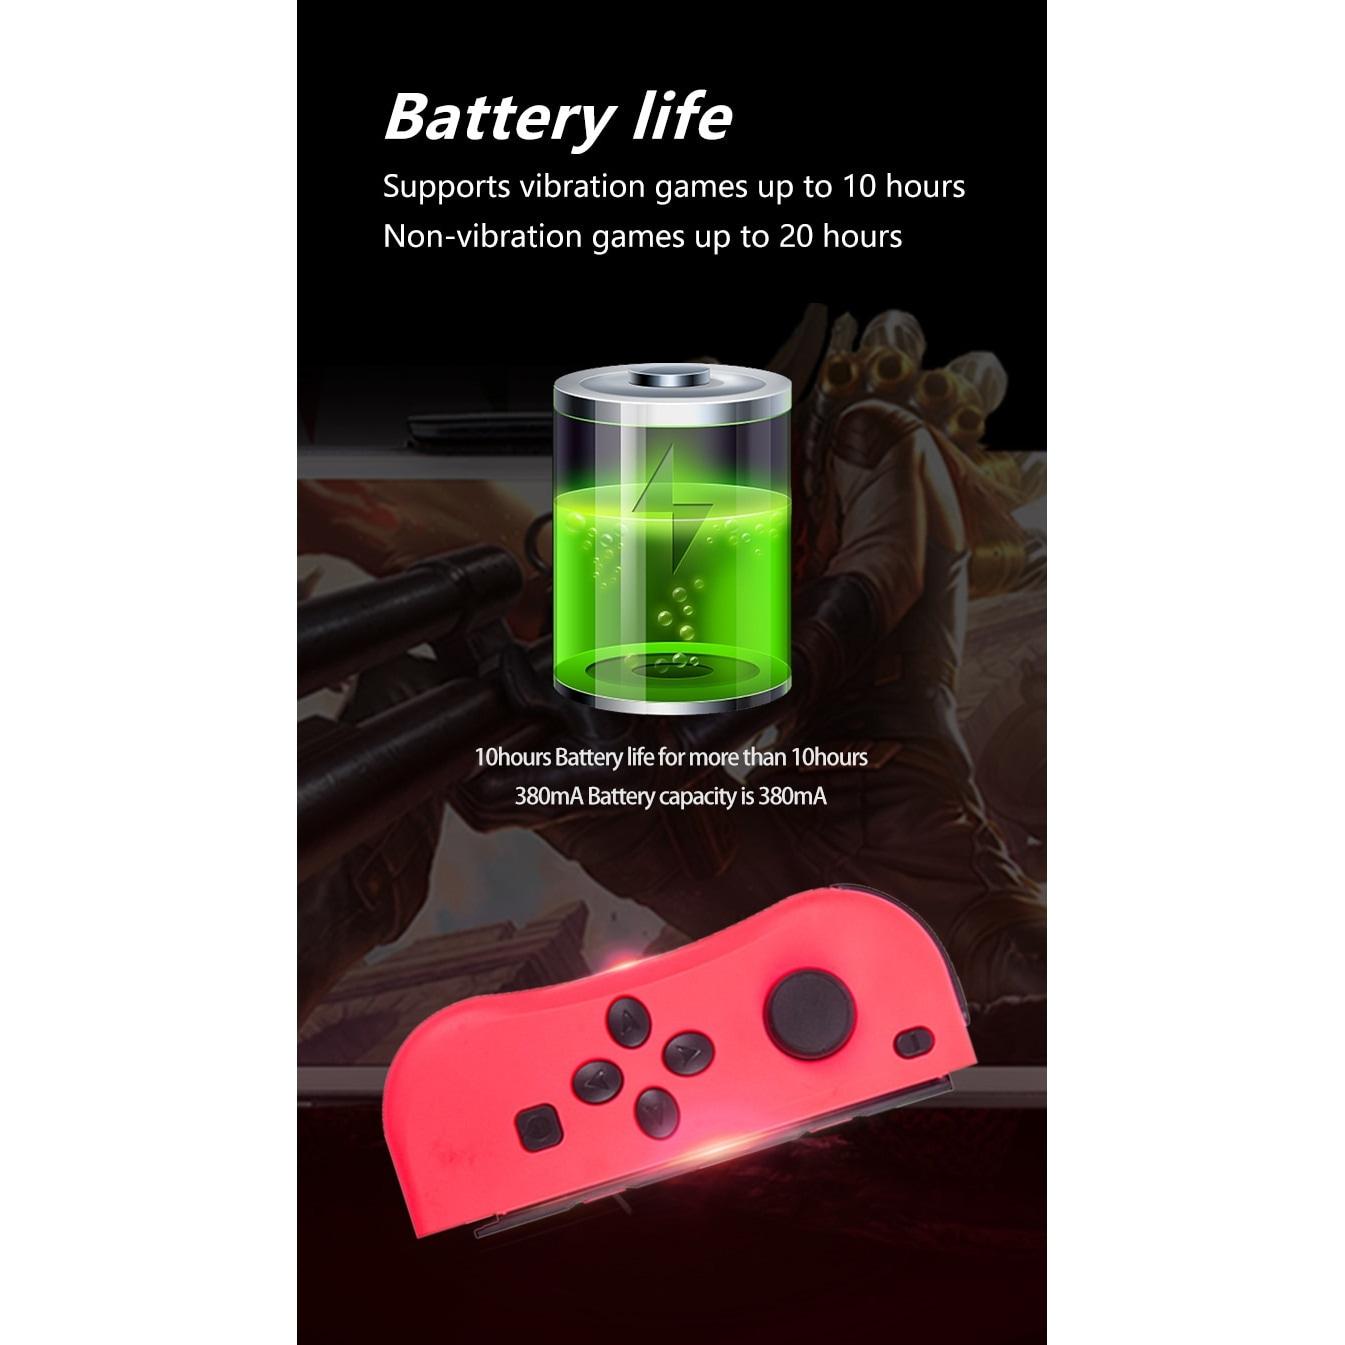 Wireless Joysticks for Nintendo Switch (L and R) Black - 4